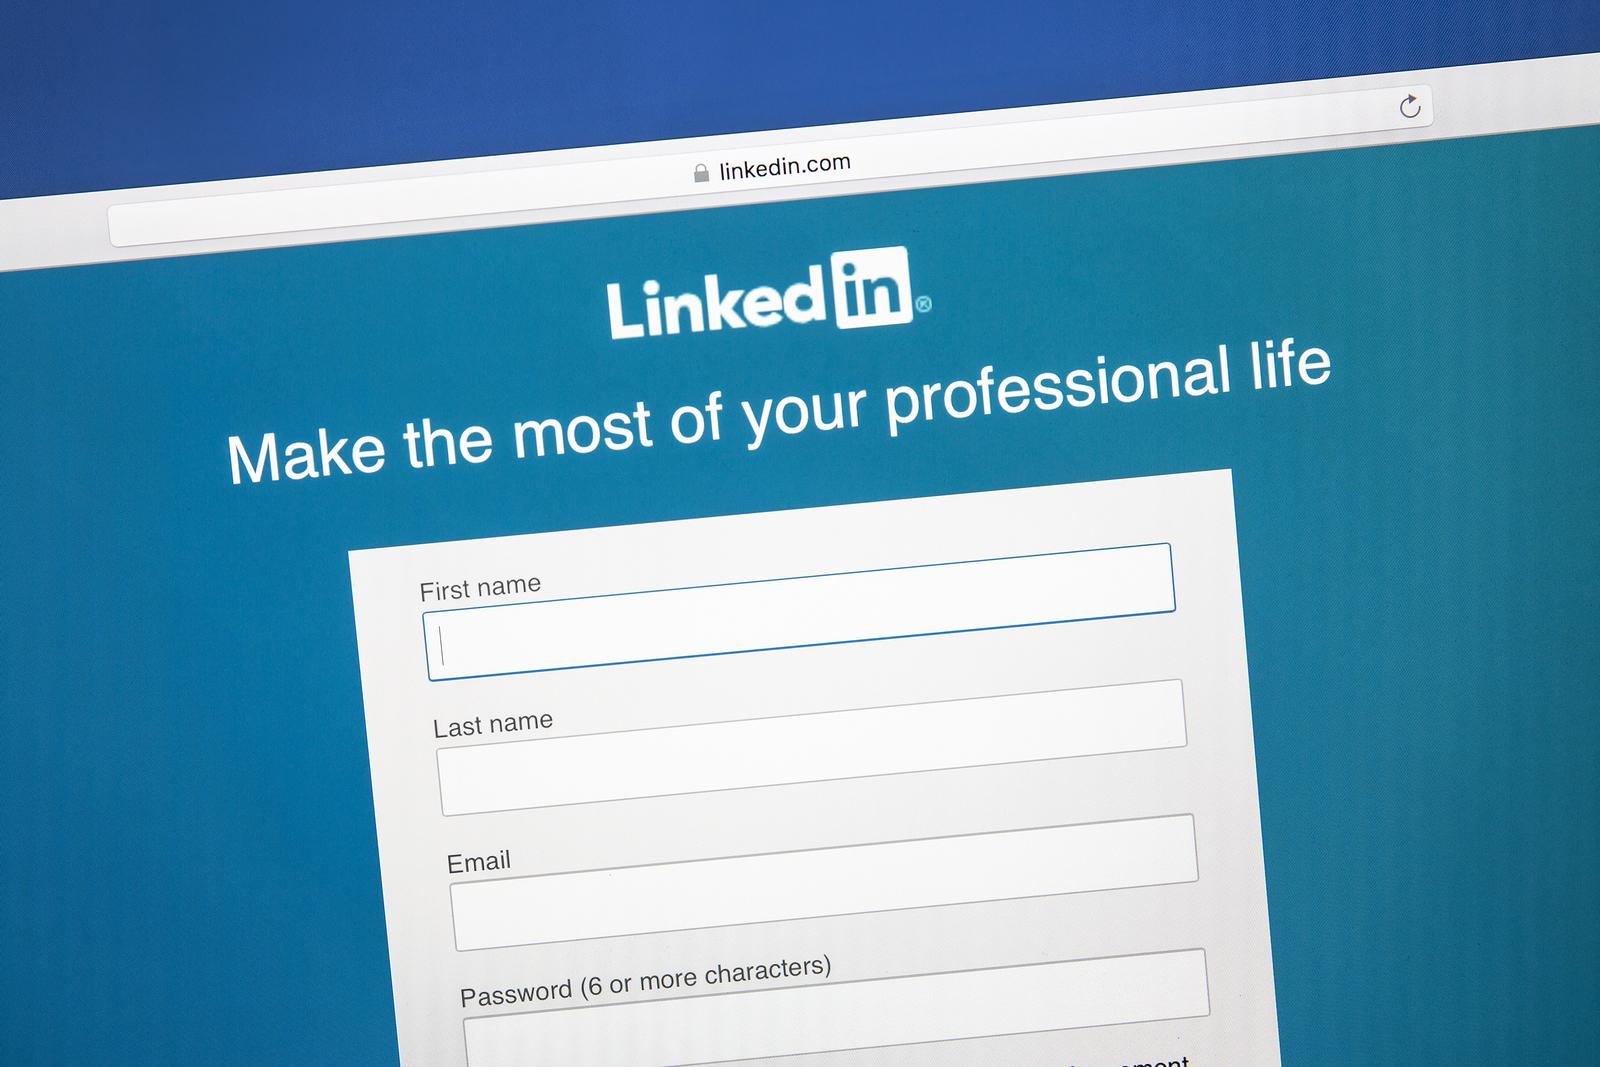 linkedin profile tips for job seekers